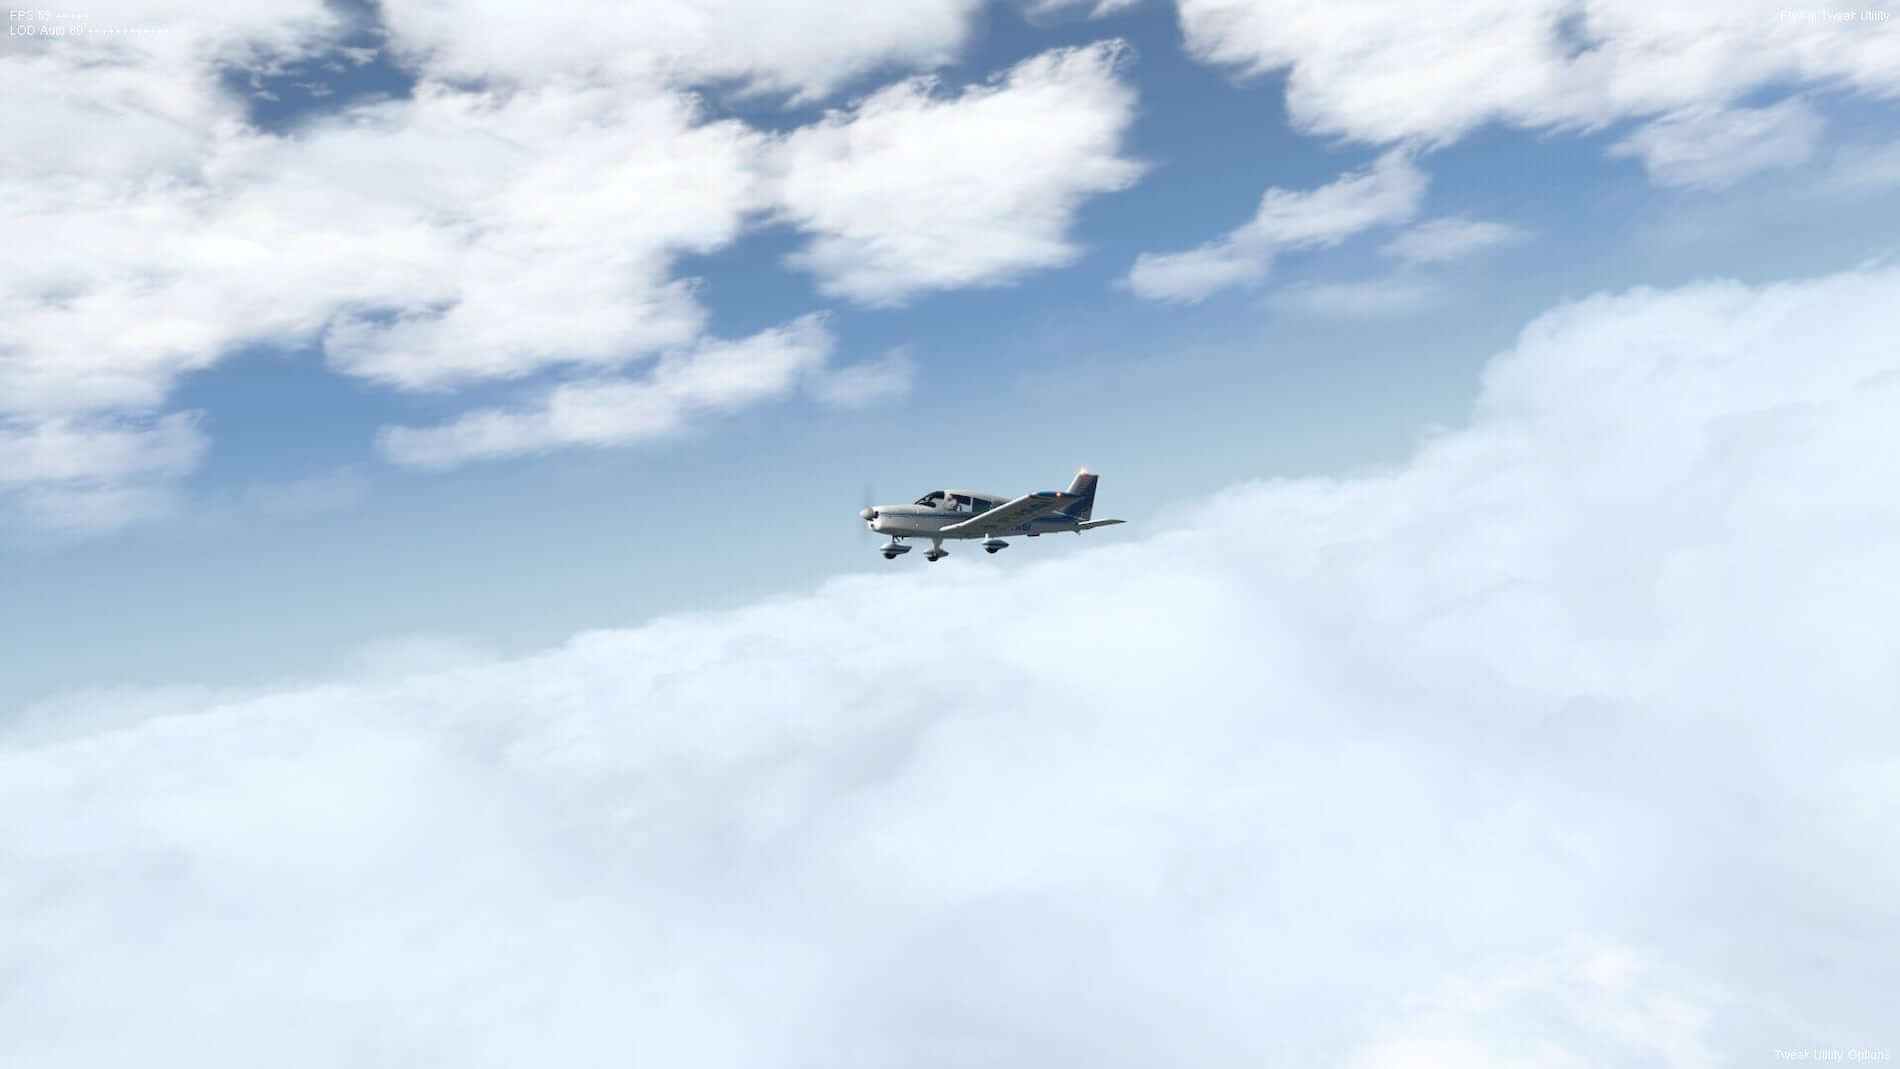 FlyAGI-FTU-Weather-System-ASXP-15